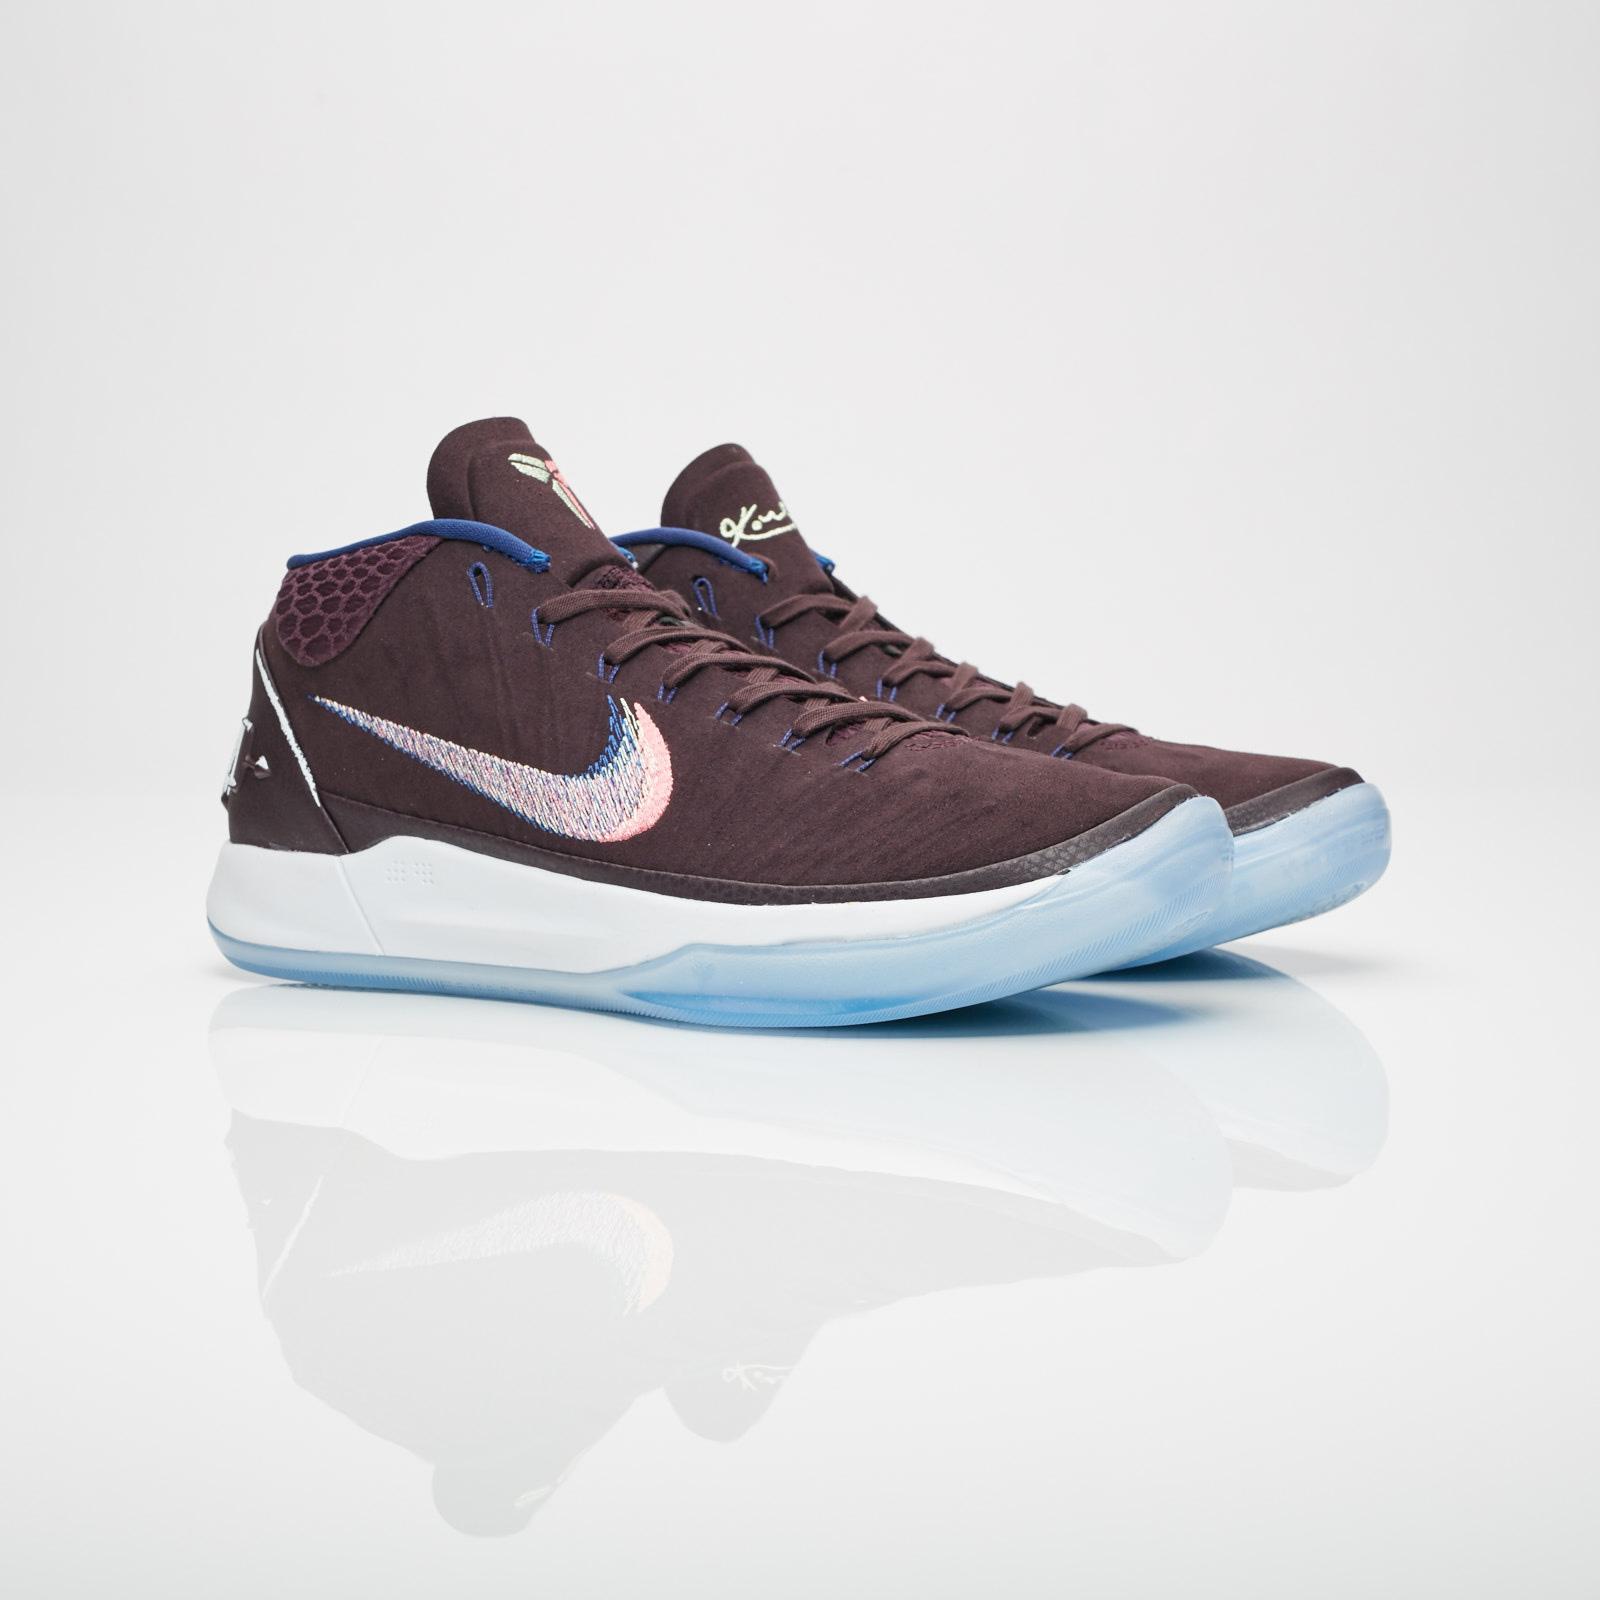 best service e0dce b9bd1 Nike Basketball Kobe AD